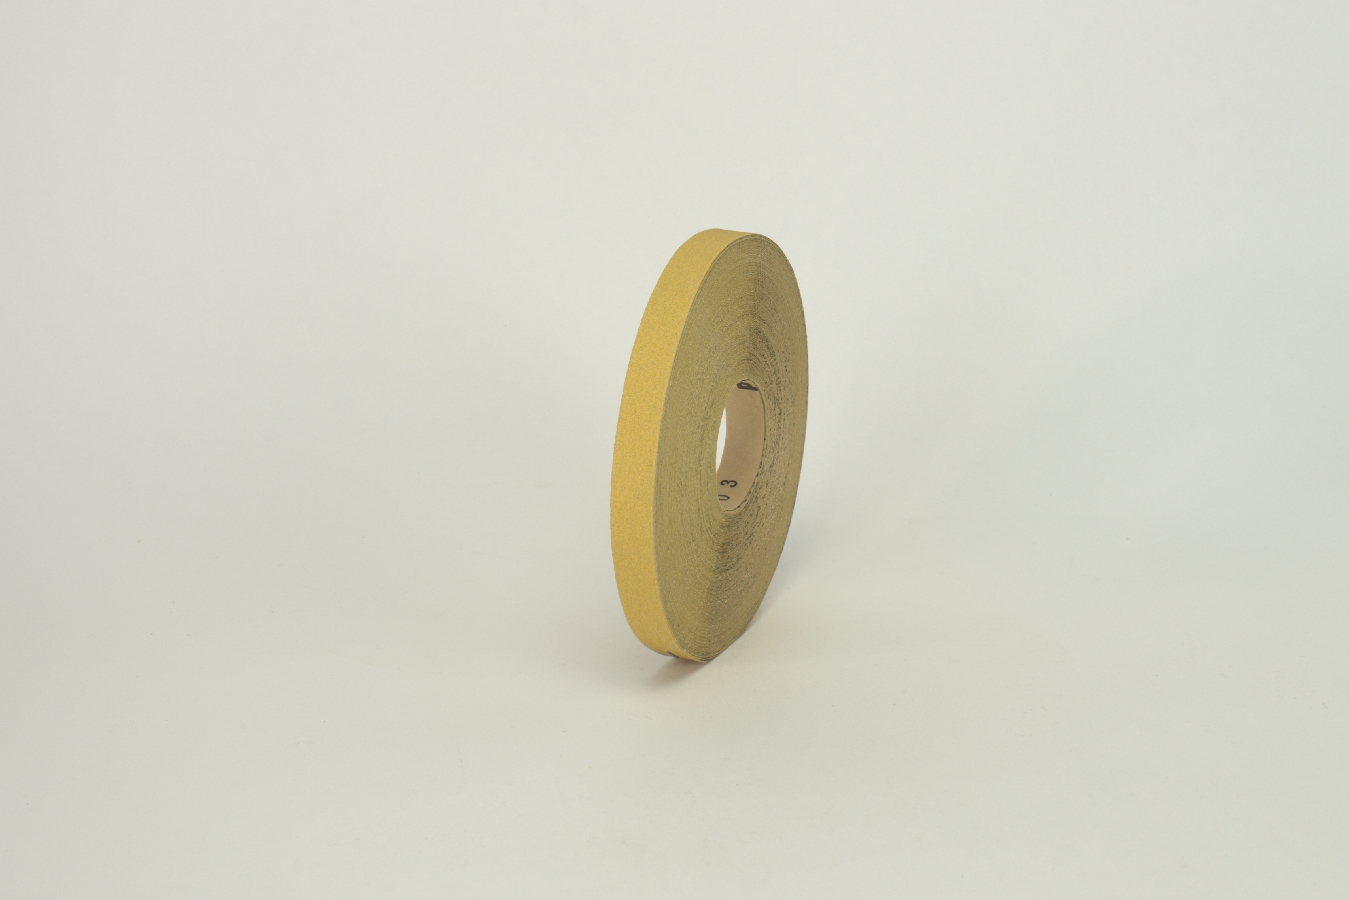 Korundpapier Kunstharz 150 50m Rl